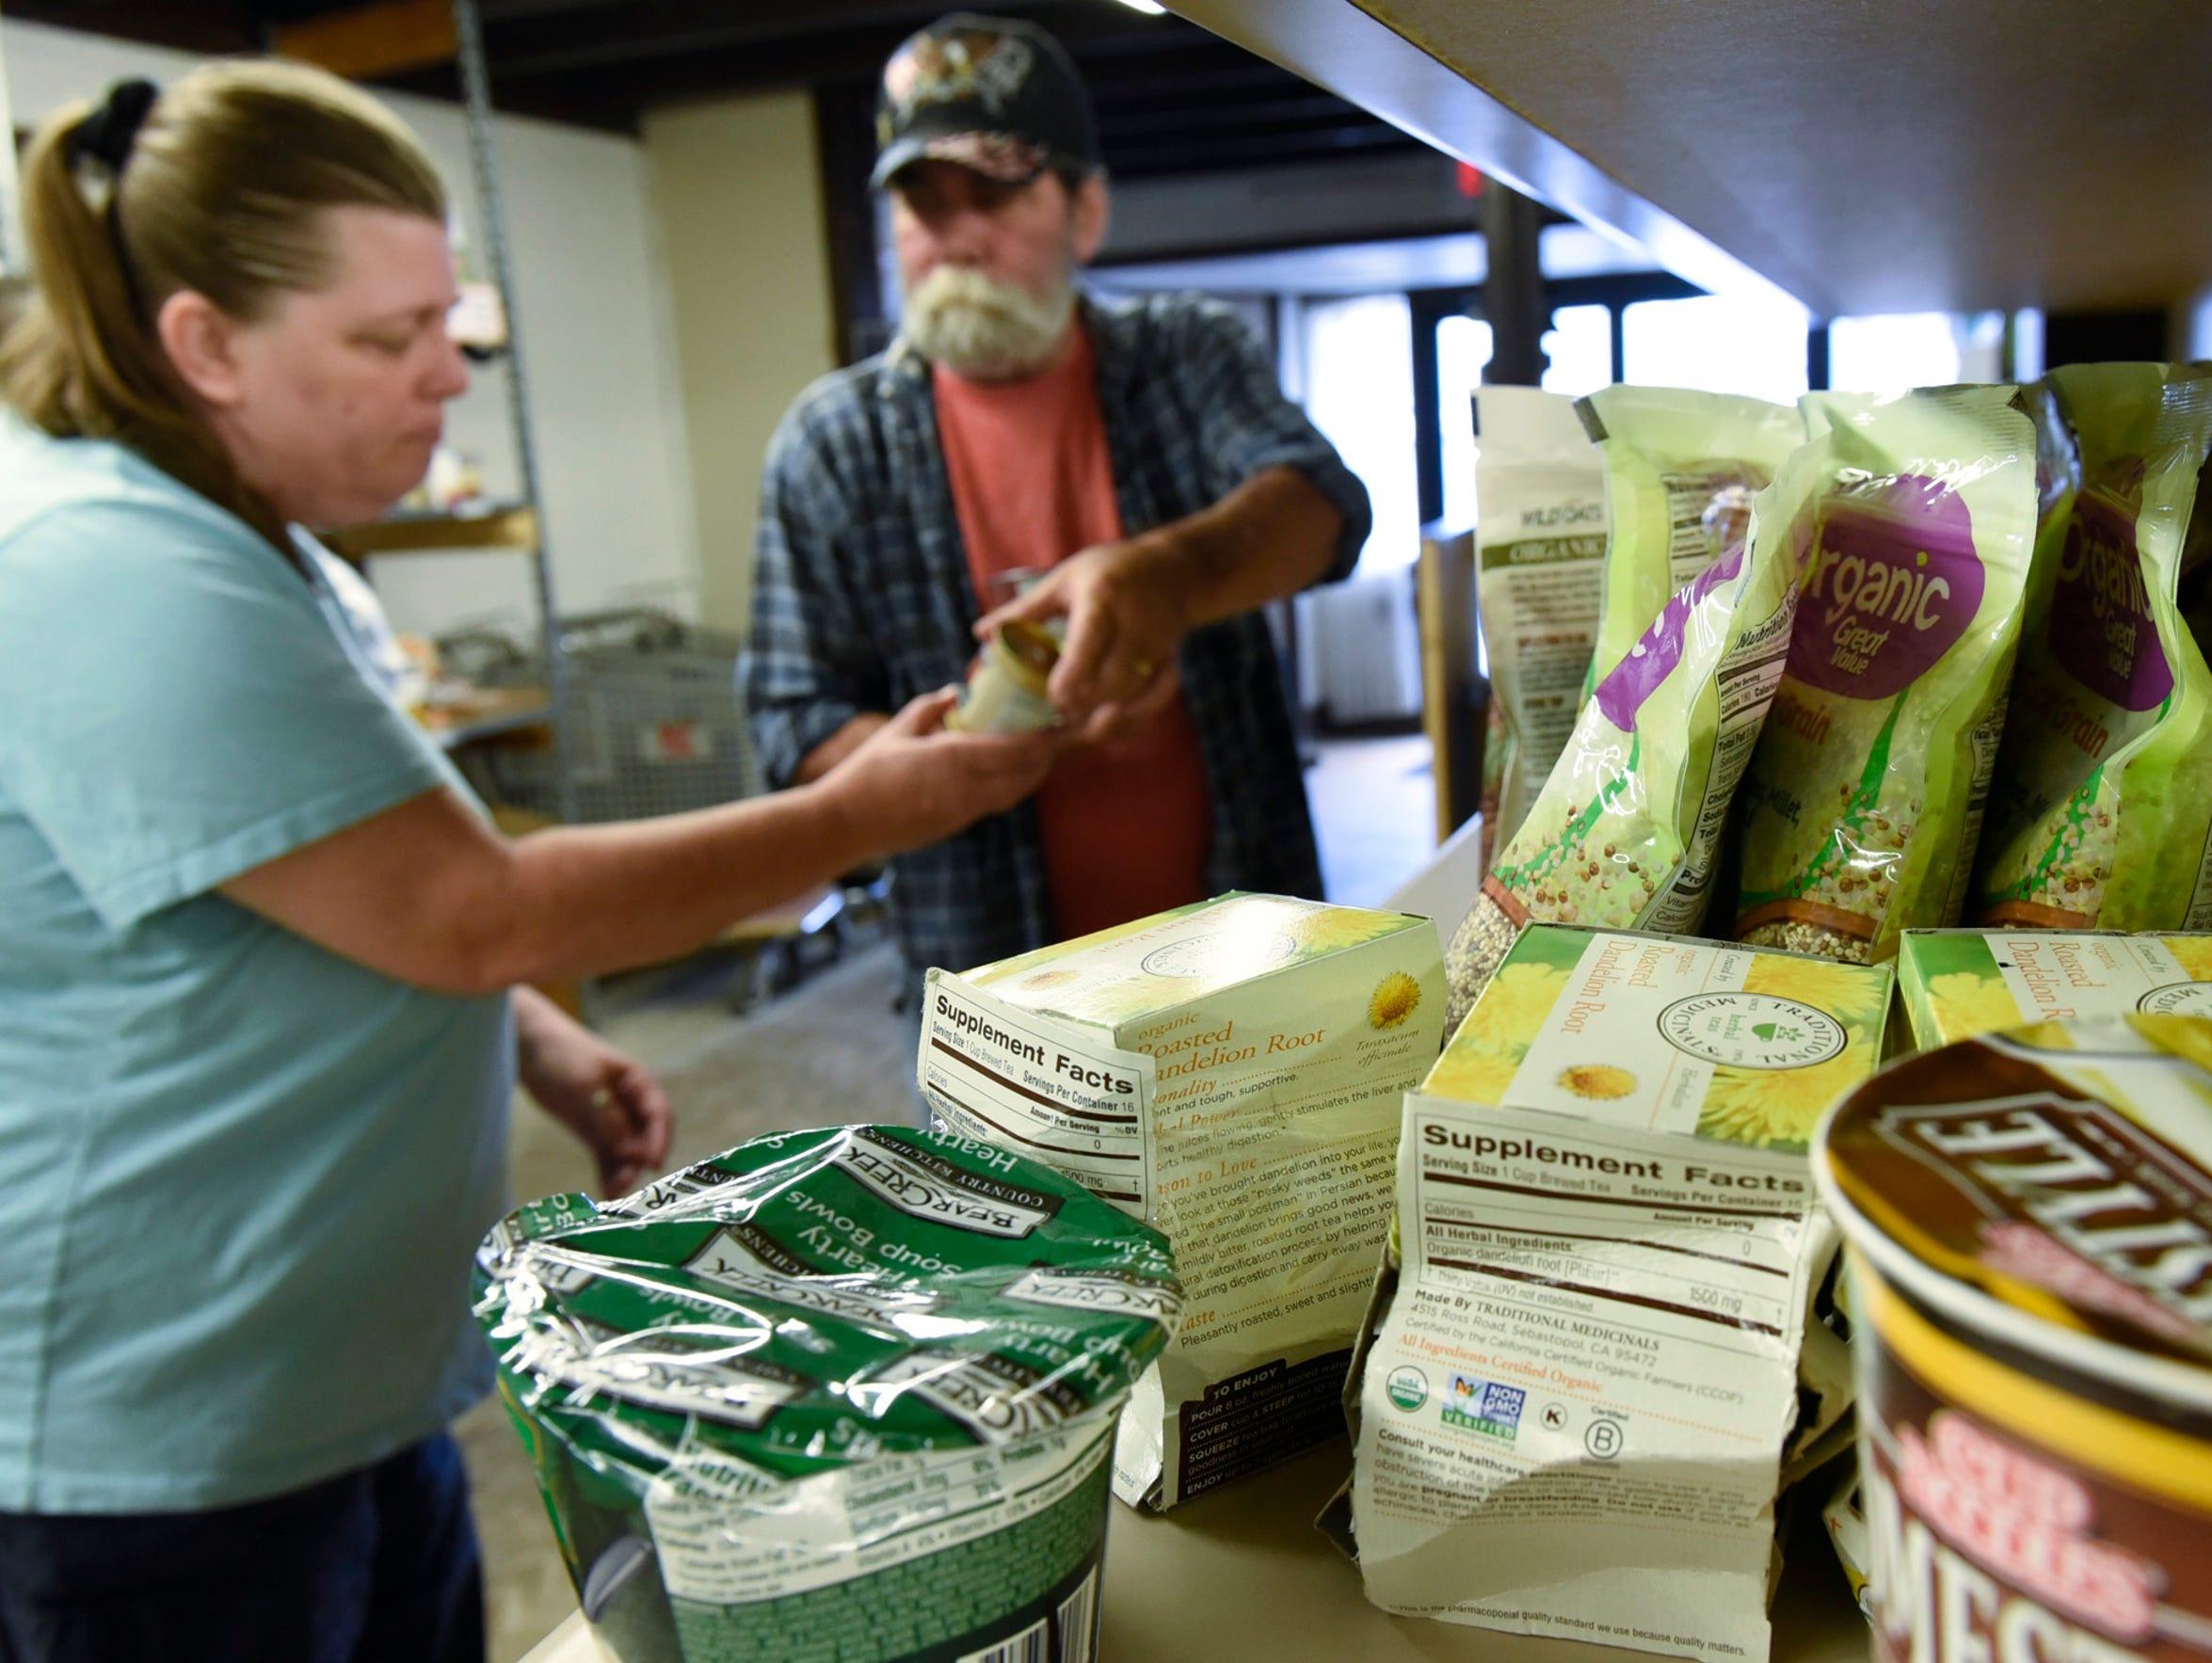 Bob and Susan Hazard shop for groceries Thursday, June